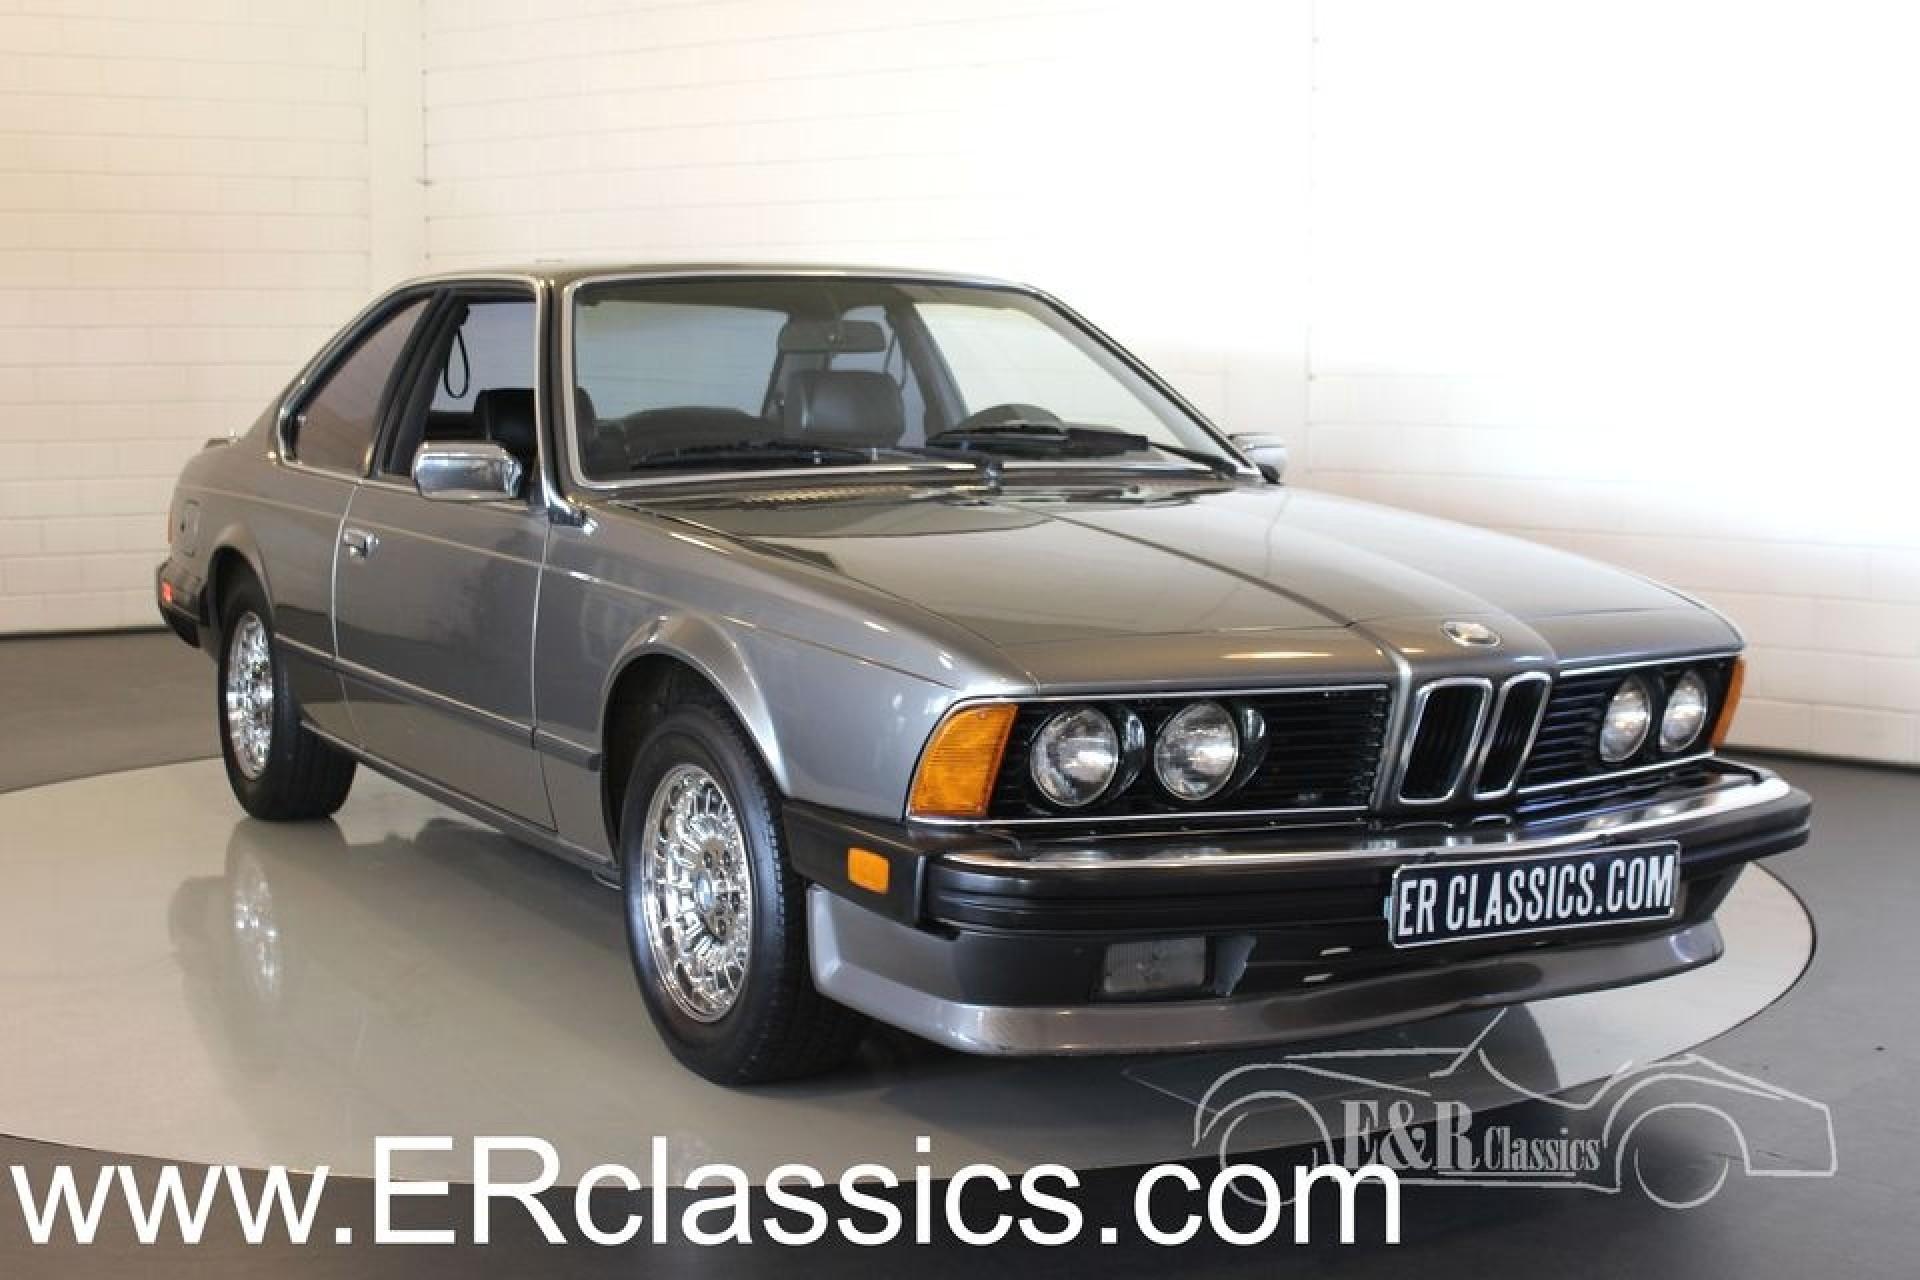 Bmw 635 Csi 1985 For Sale At Erclassics